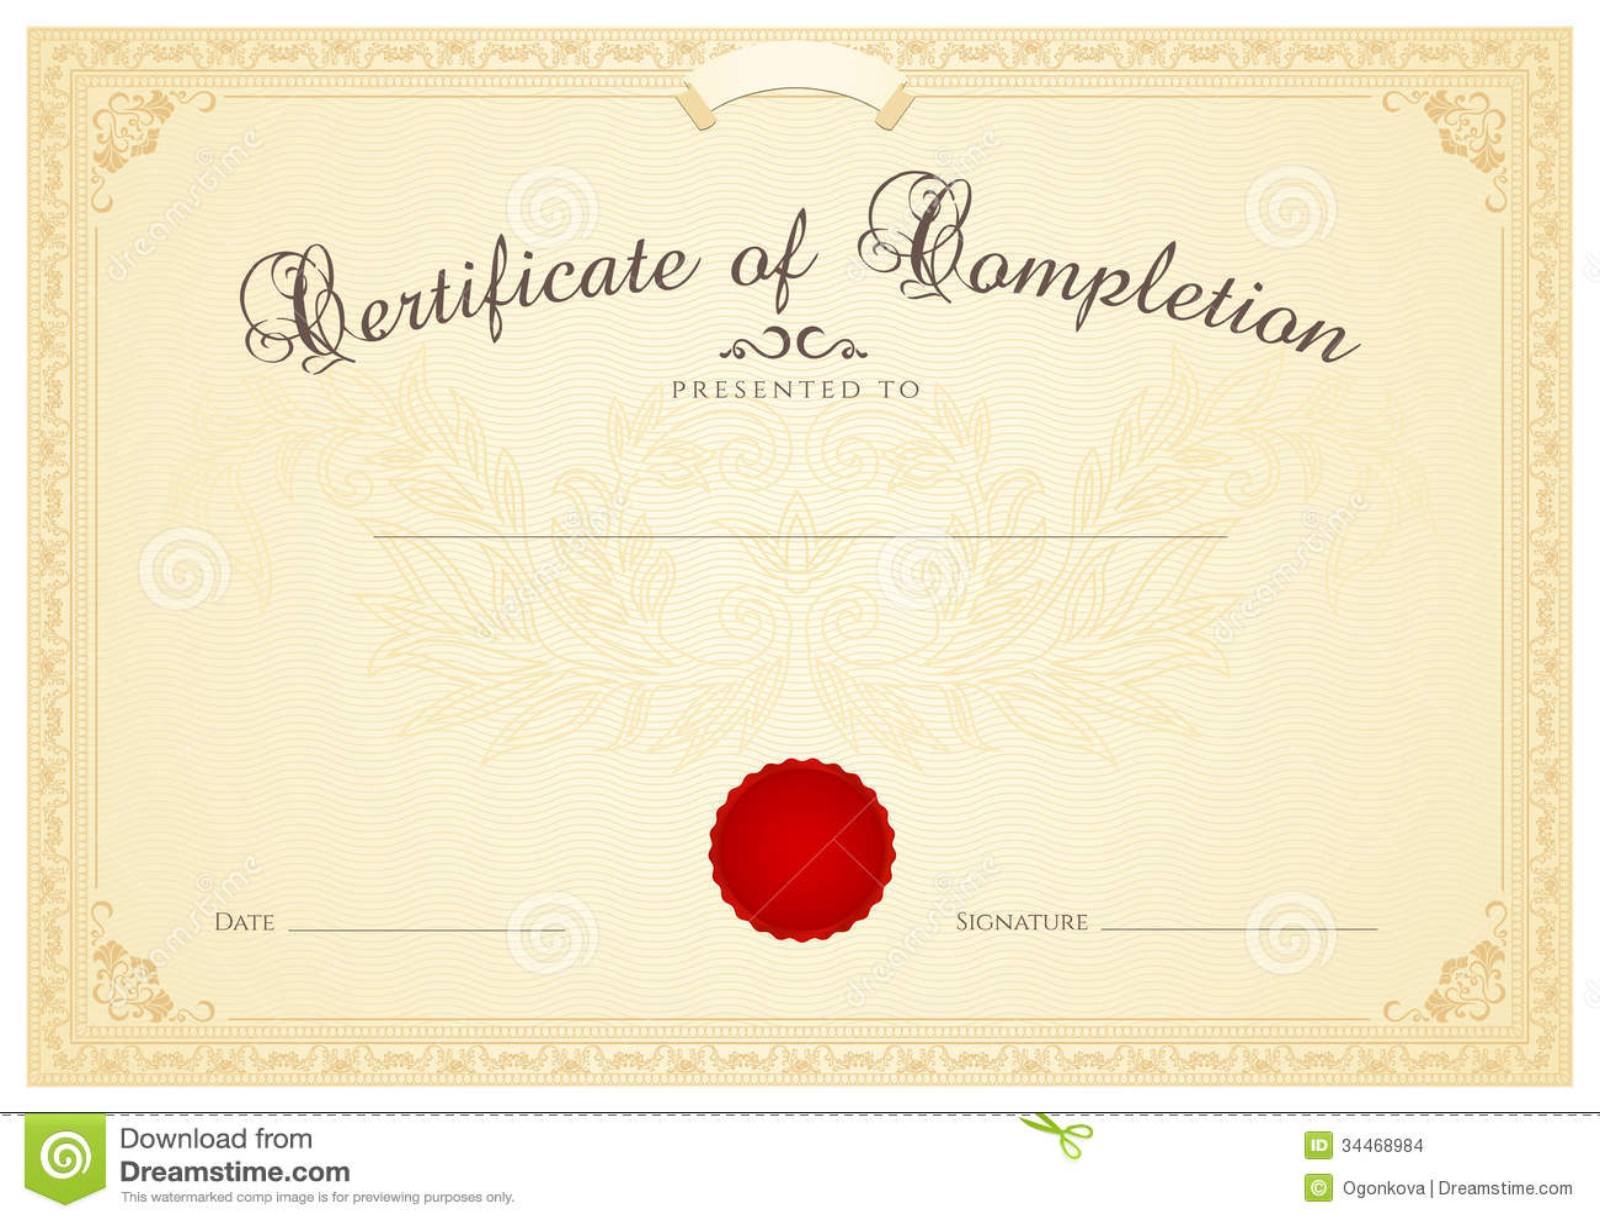 certificate seal template